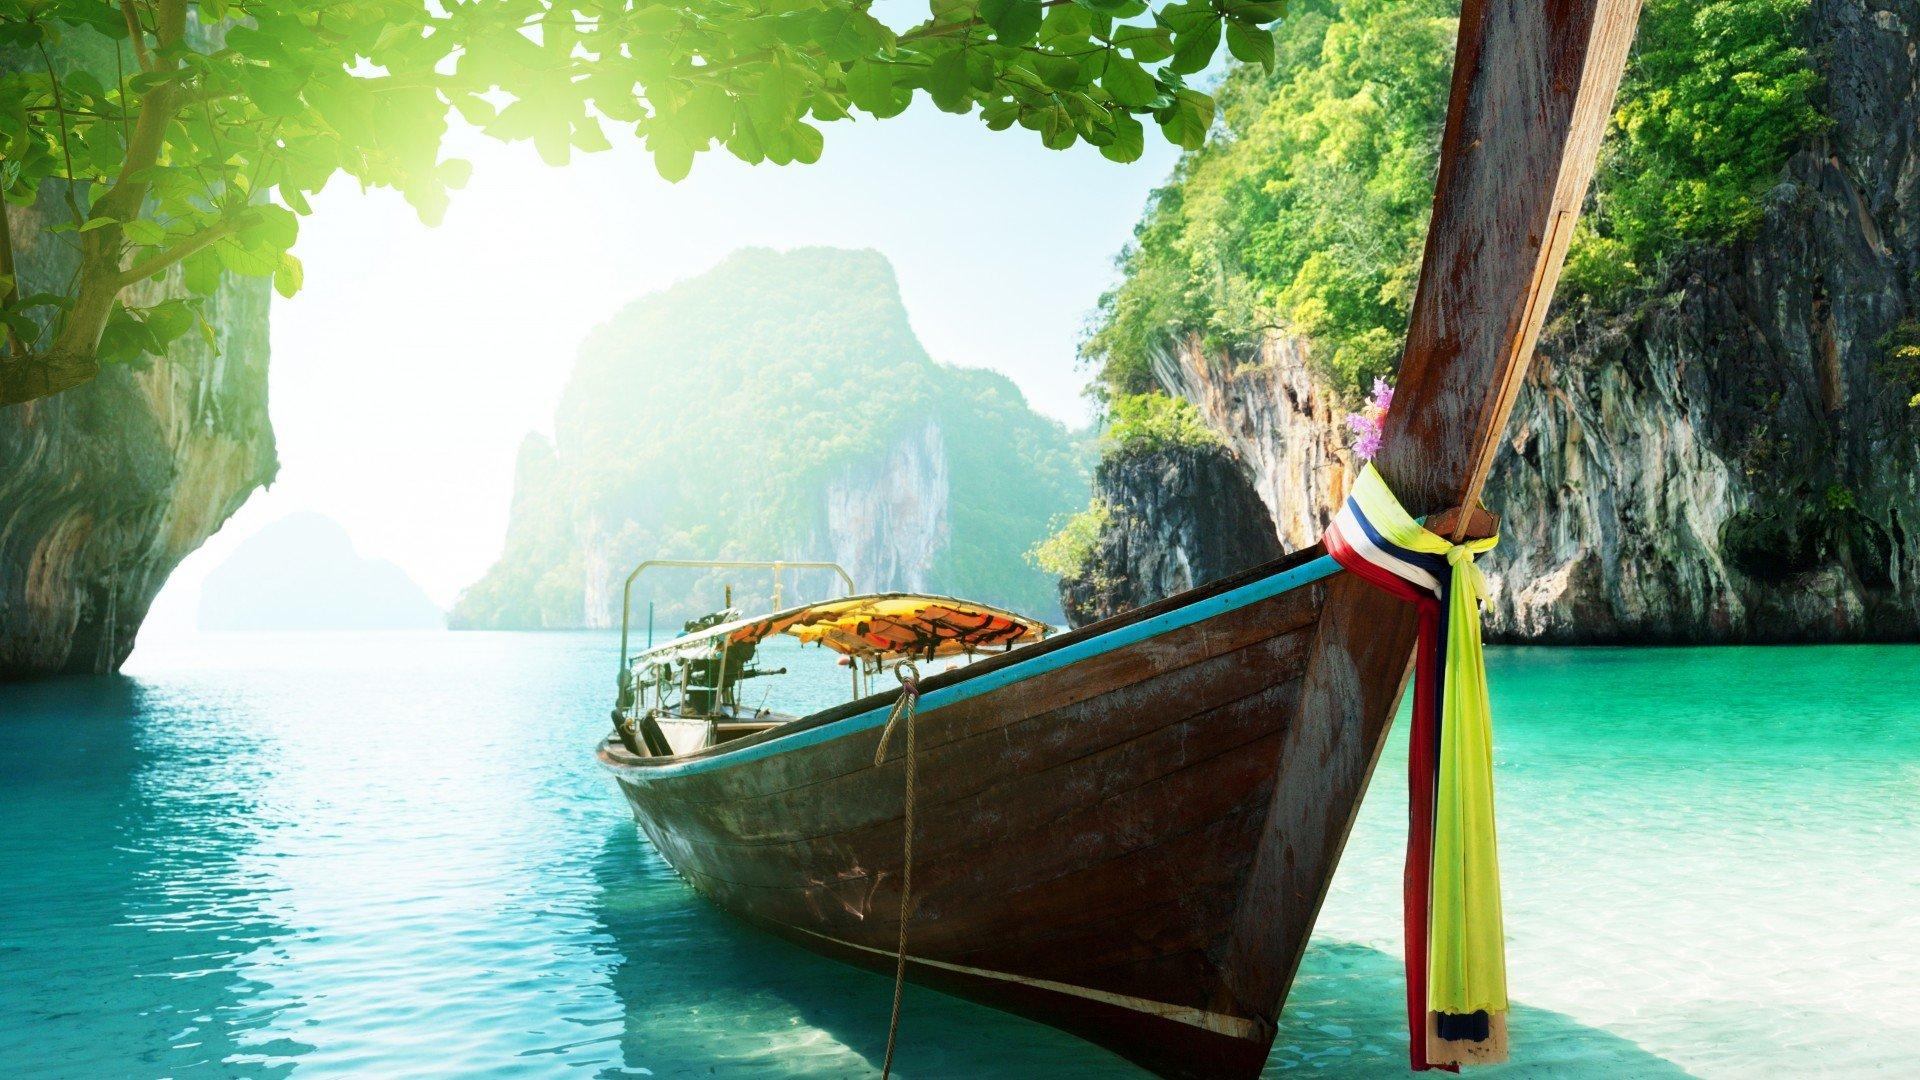 thailand wallpaper